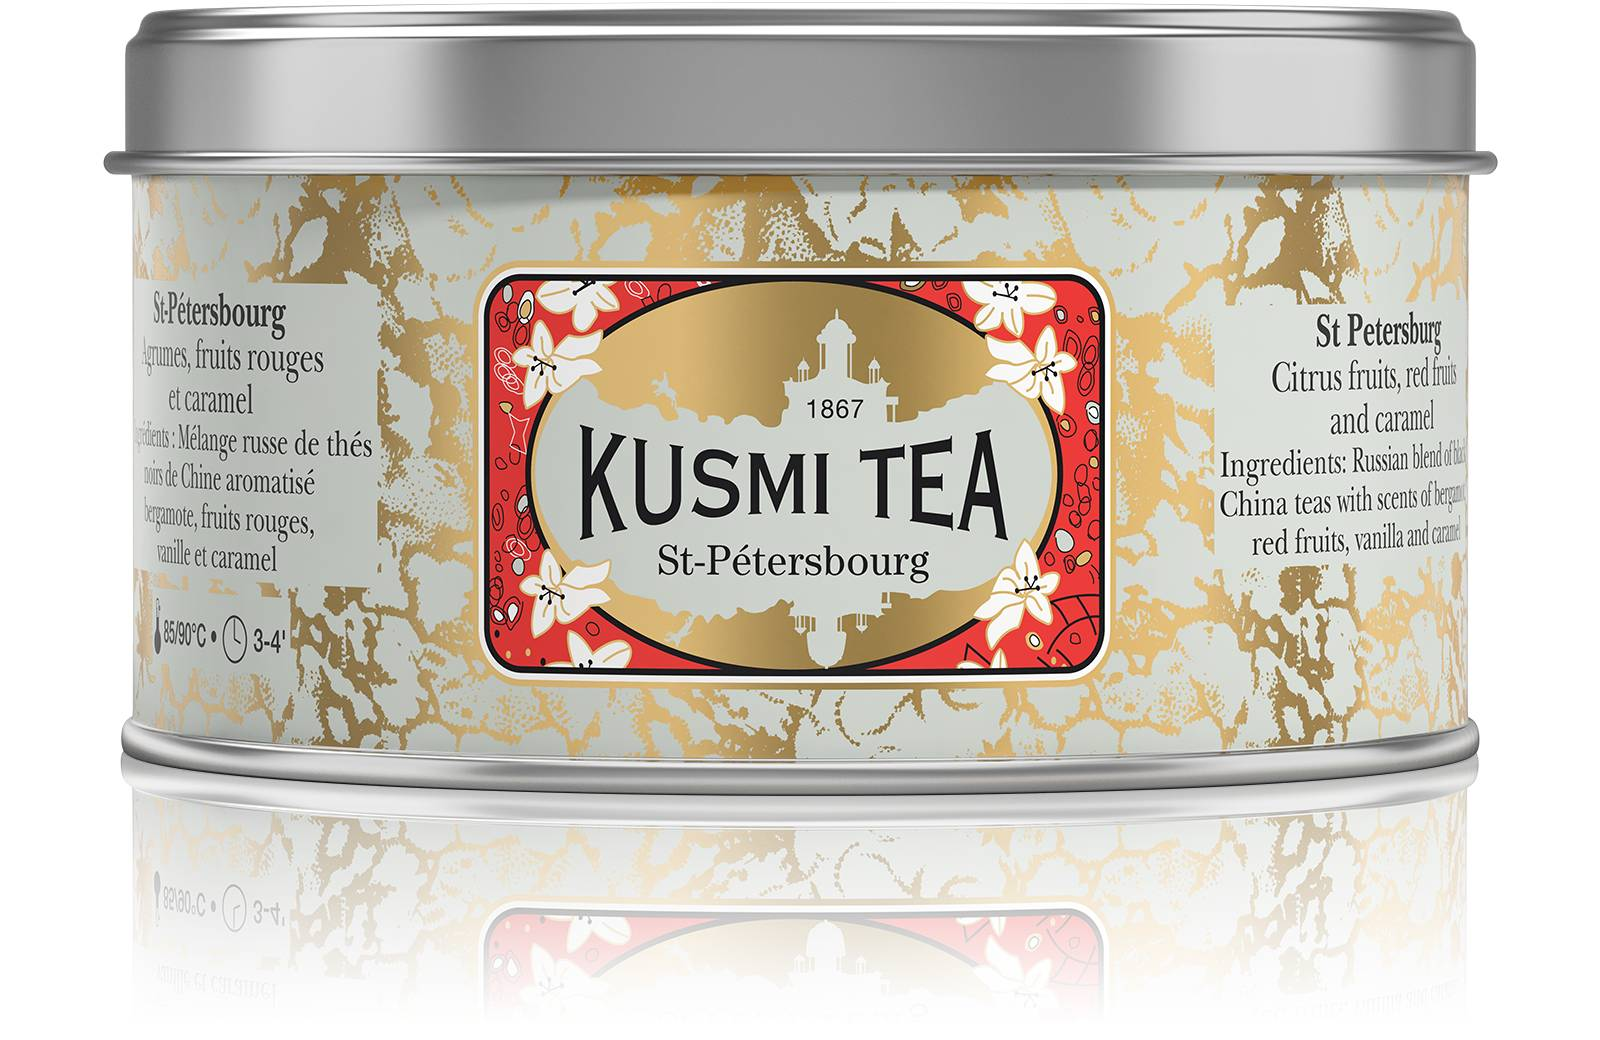 KUSMI TEA St-Pétersbourg  Thé noir  Kusmi Tea